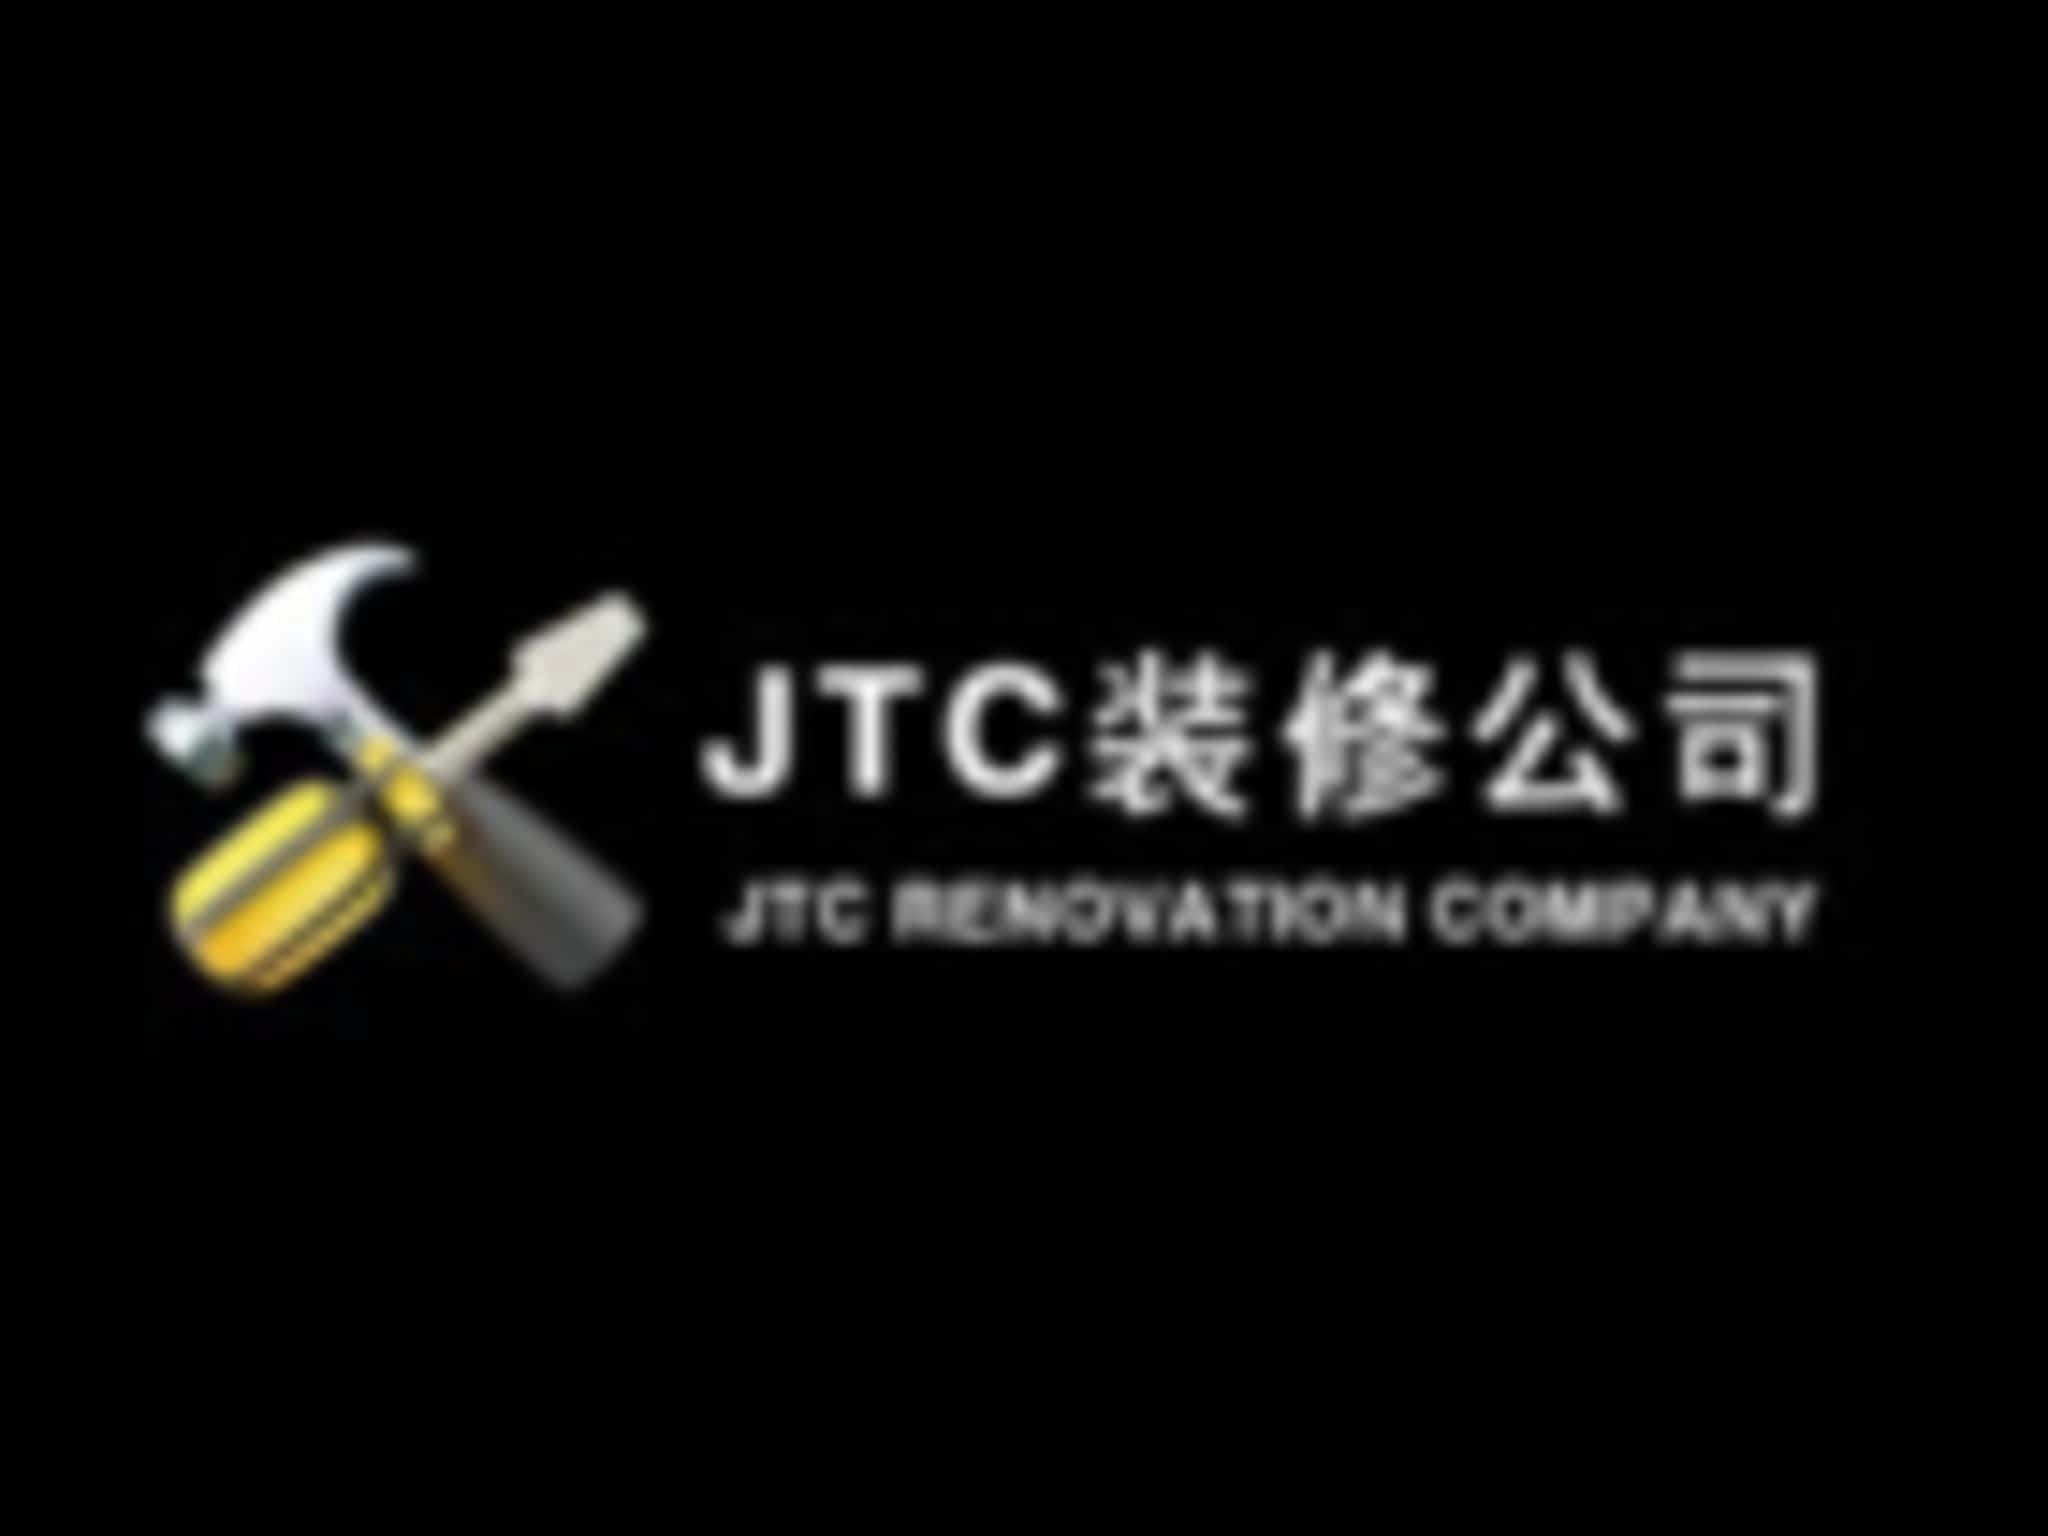 photo JTC Renovation Company